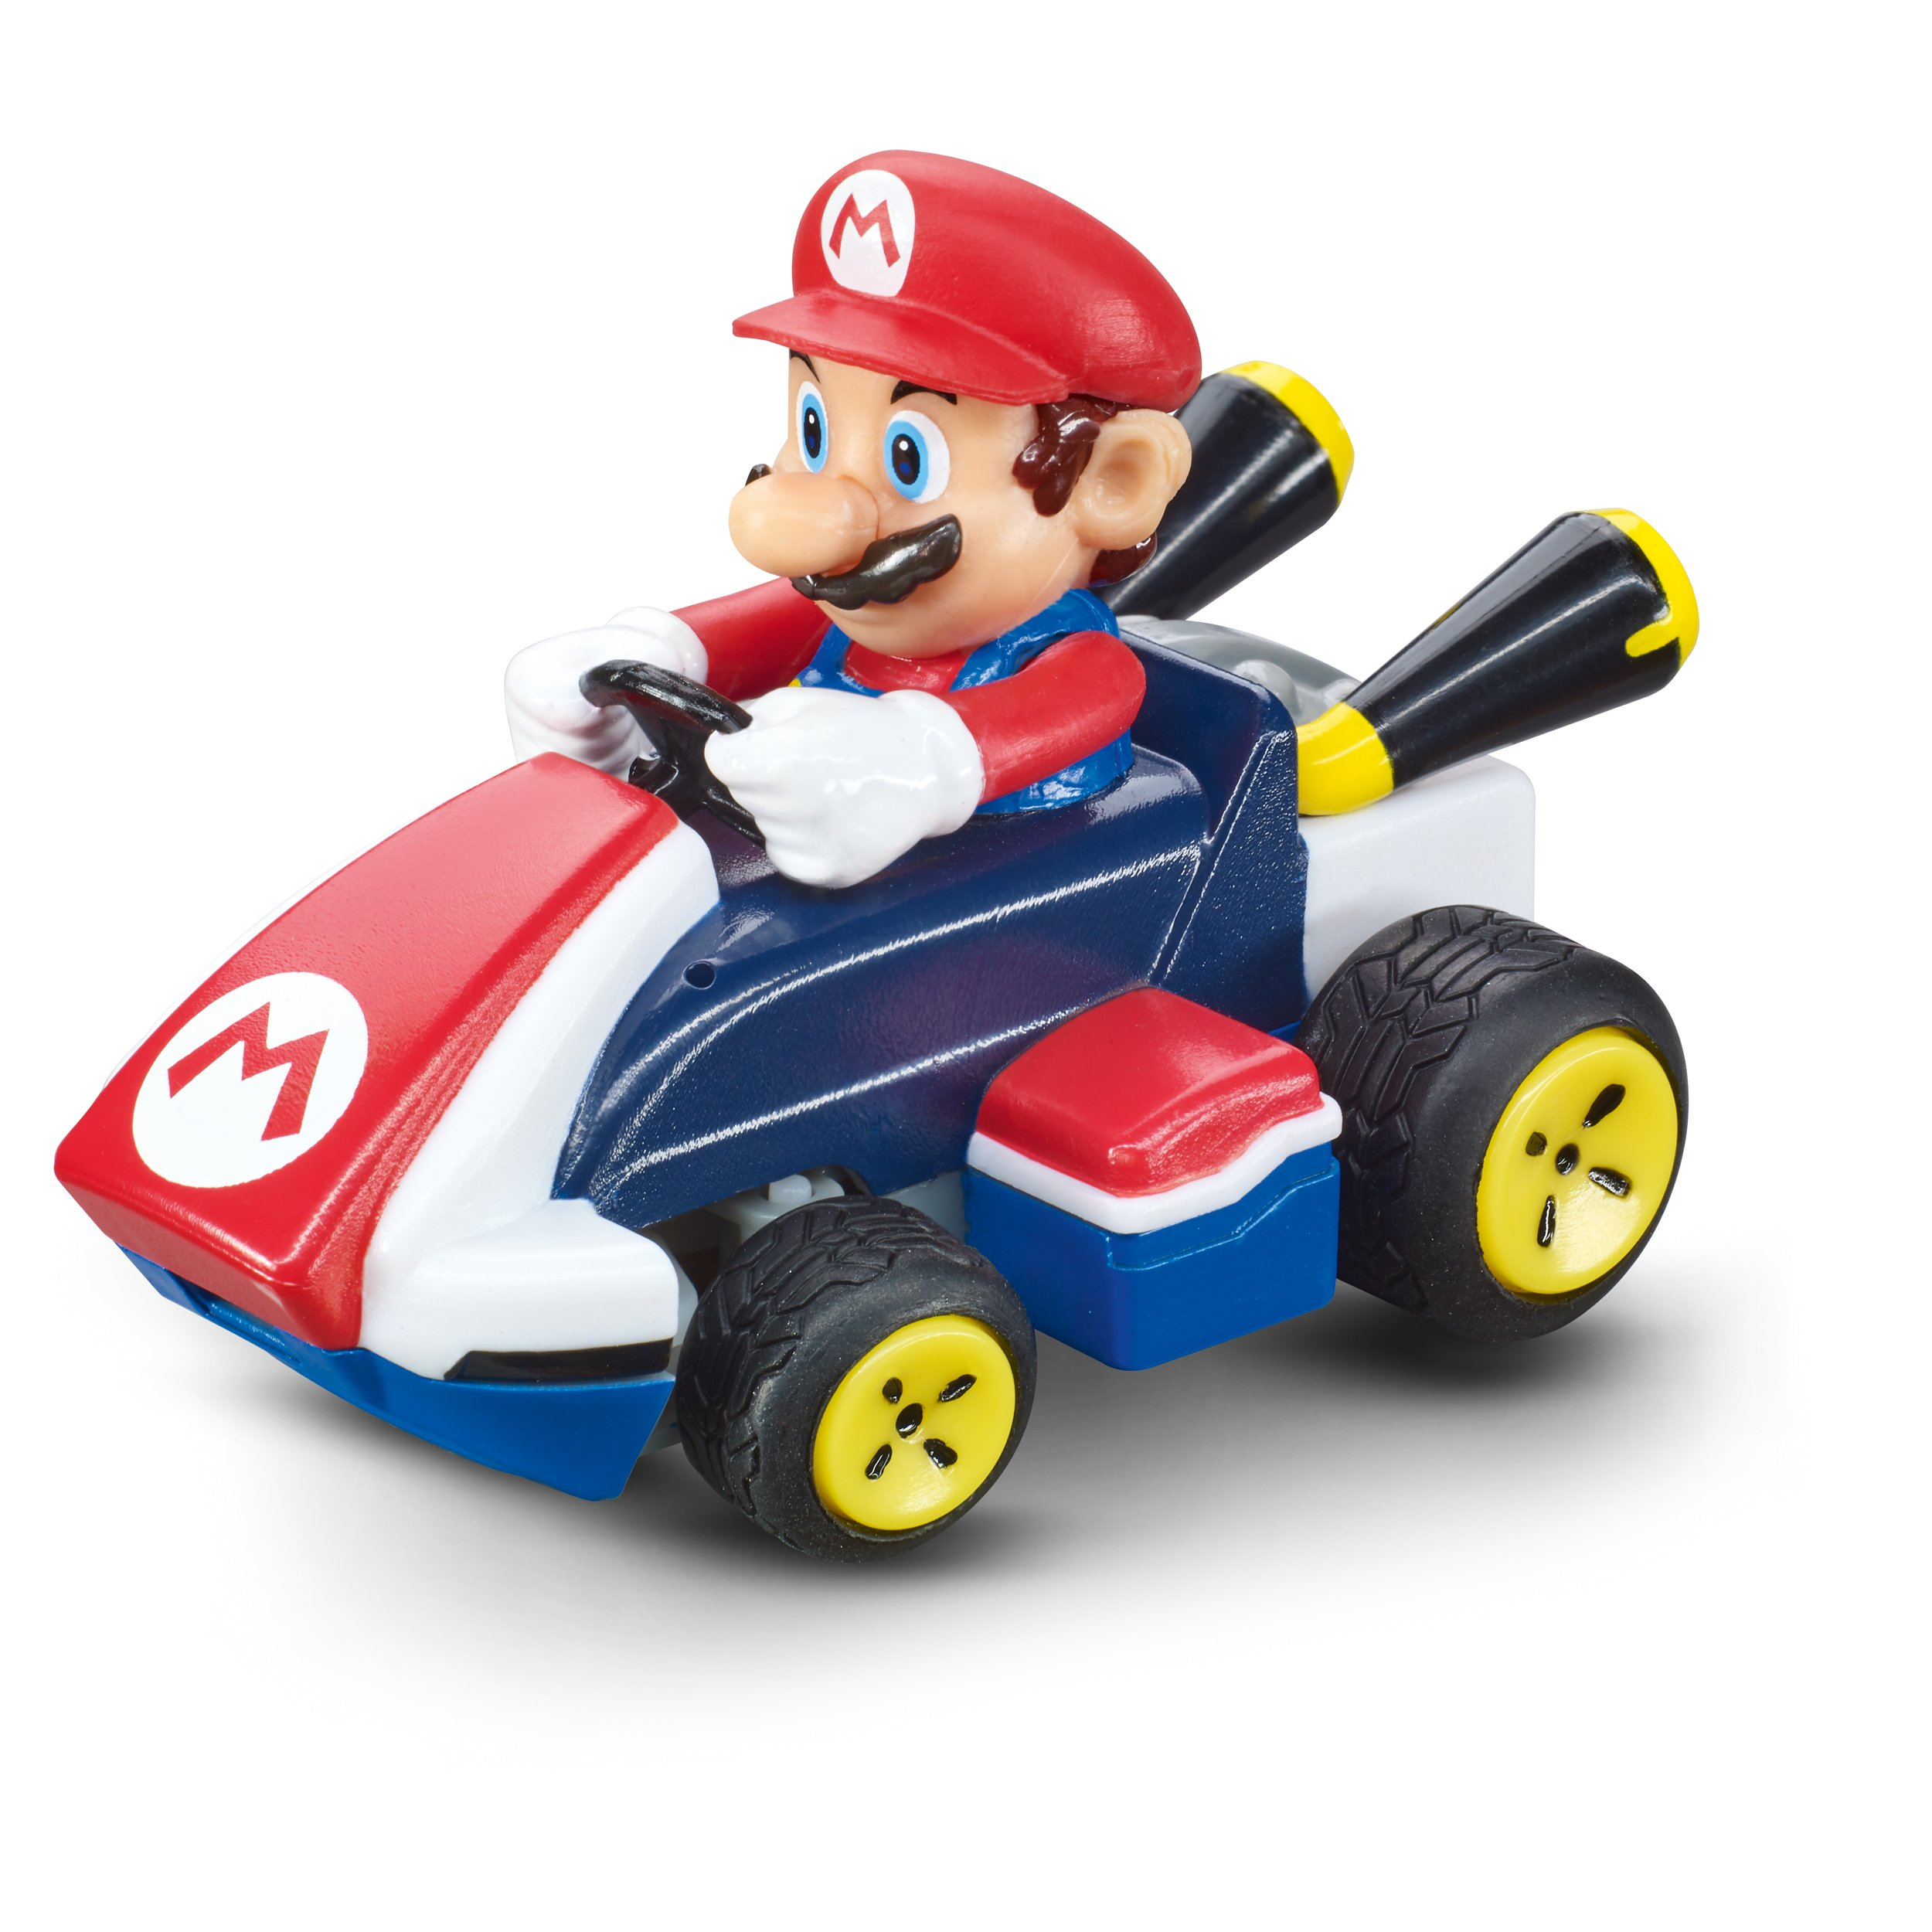 Carrera - Nintendo 2,4GHZ - Super Mario RC Mini - Mario (370430002)